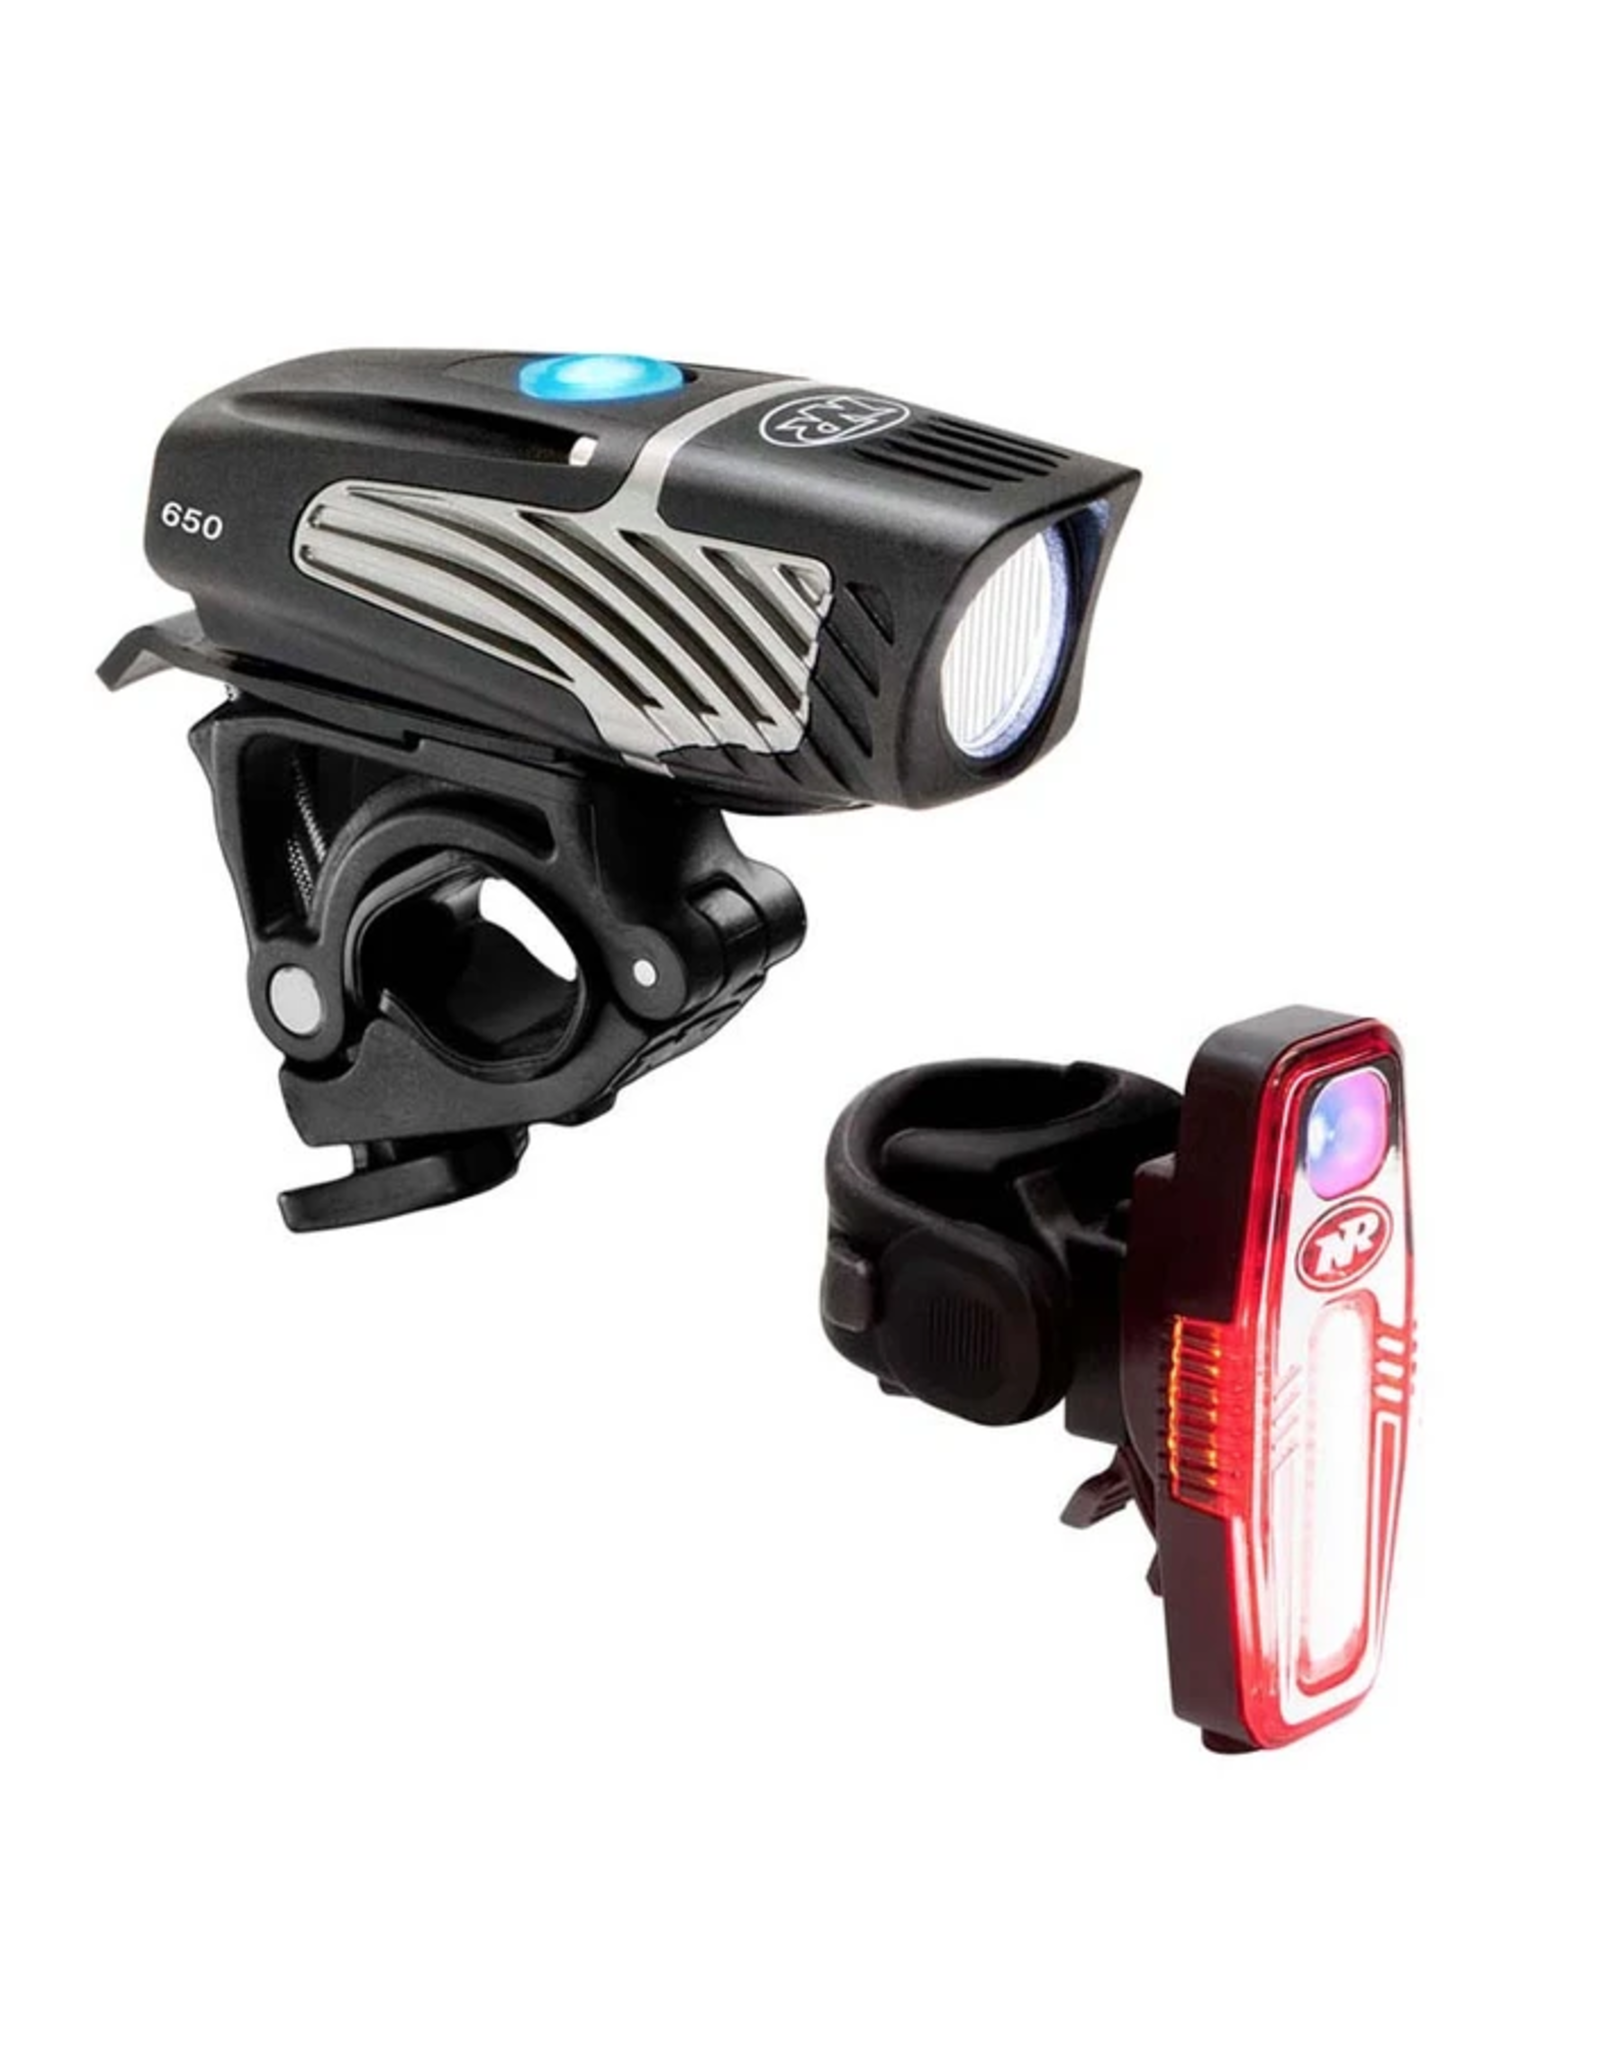 NiteRider NiteRider Lumina Micro 650 and Sabre 110 Headlight and Taillight Set